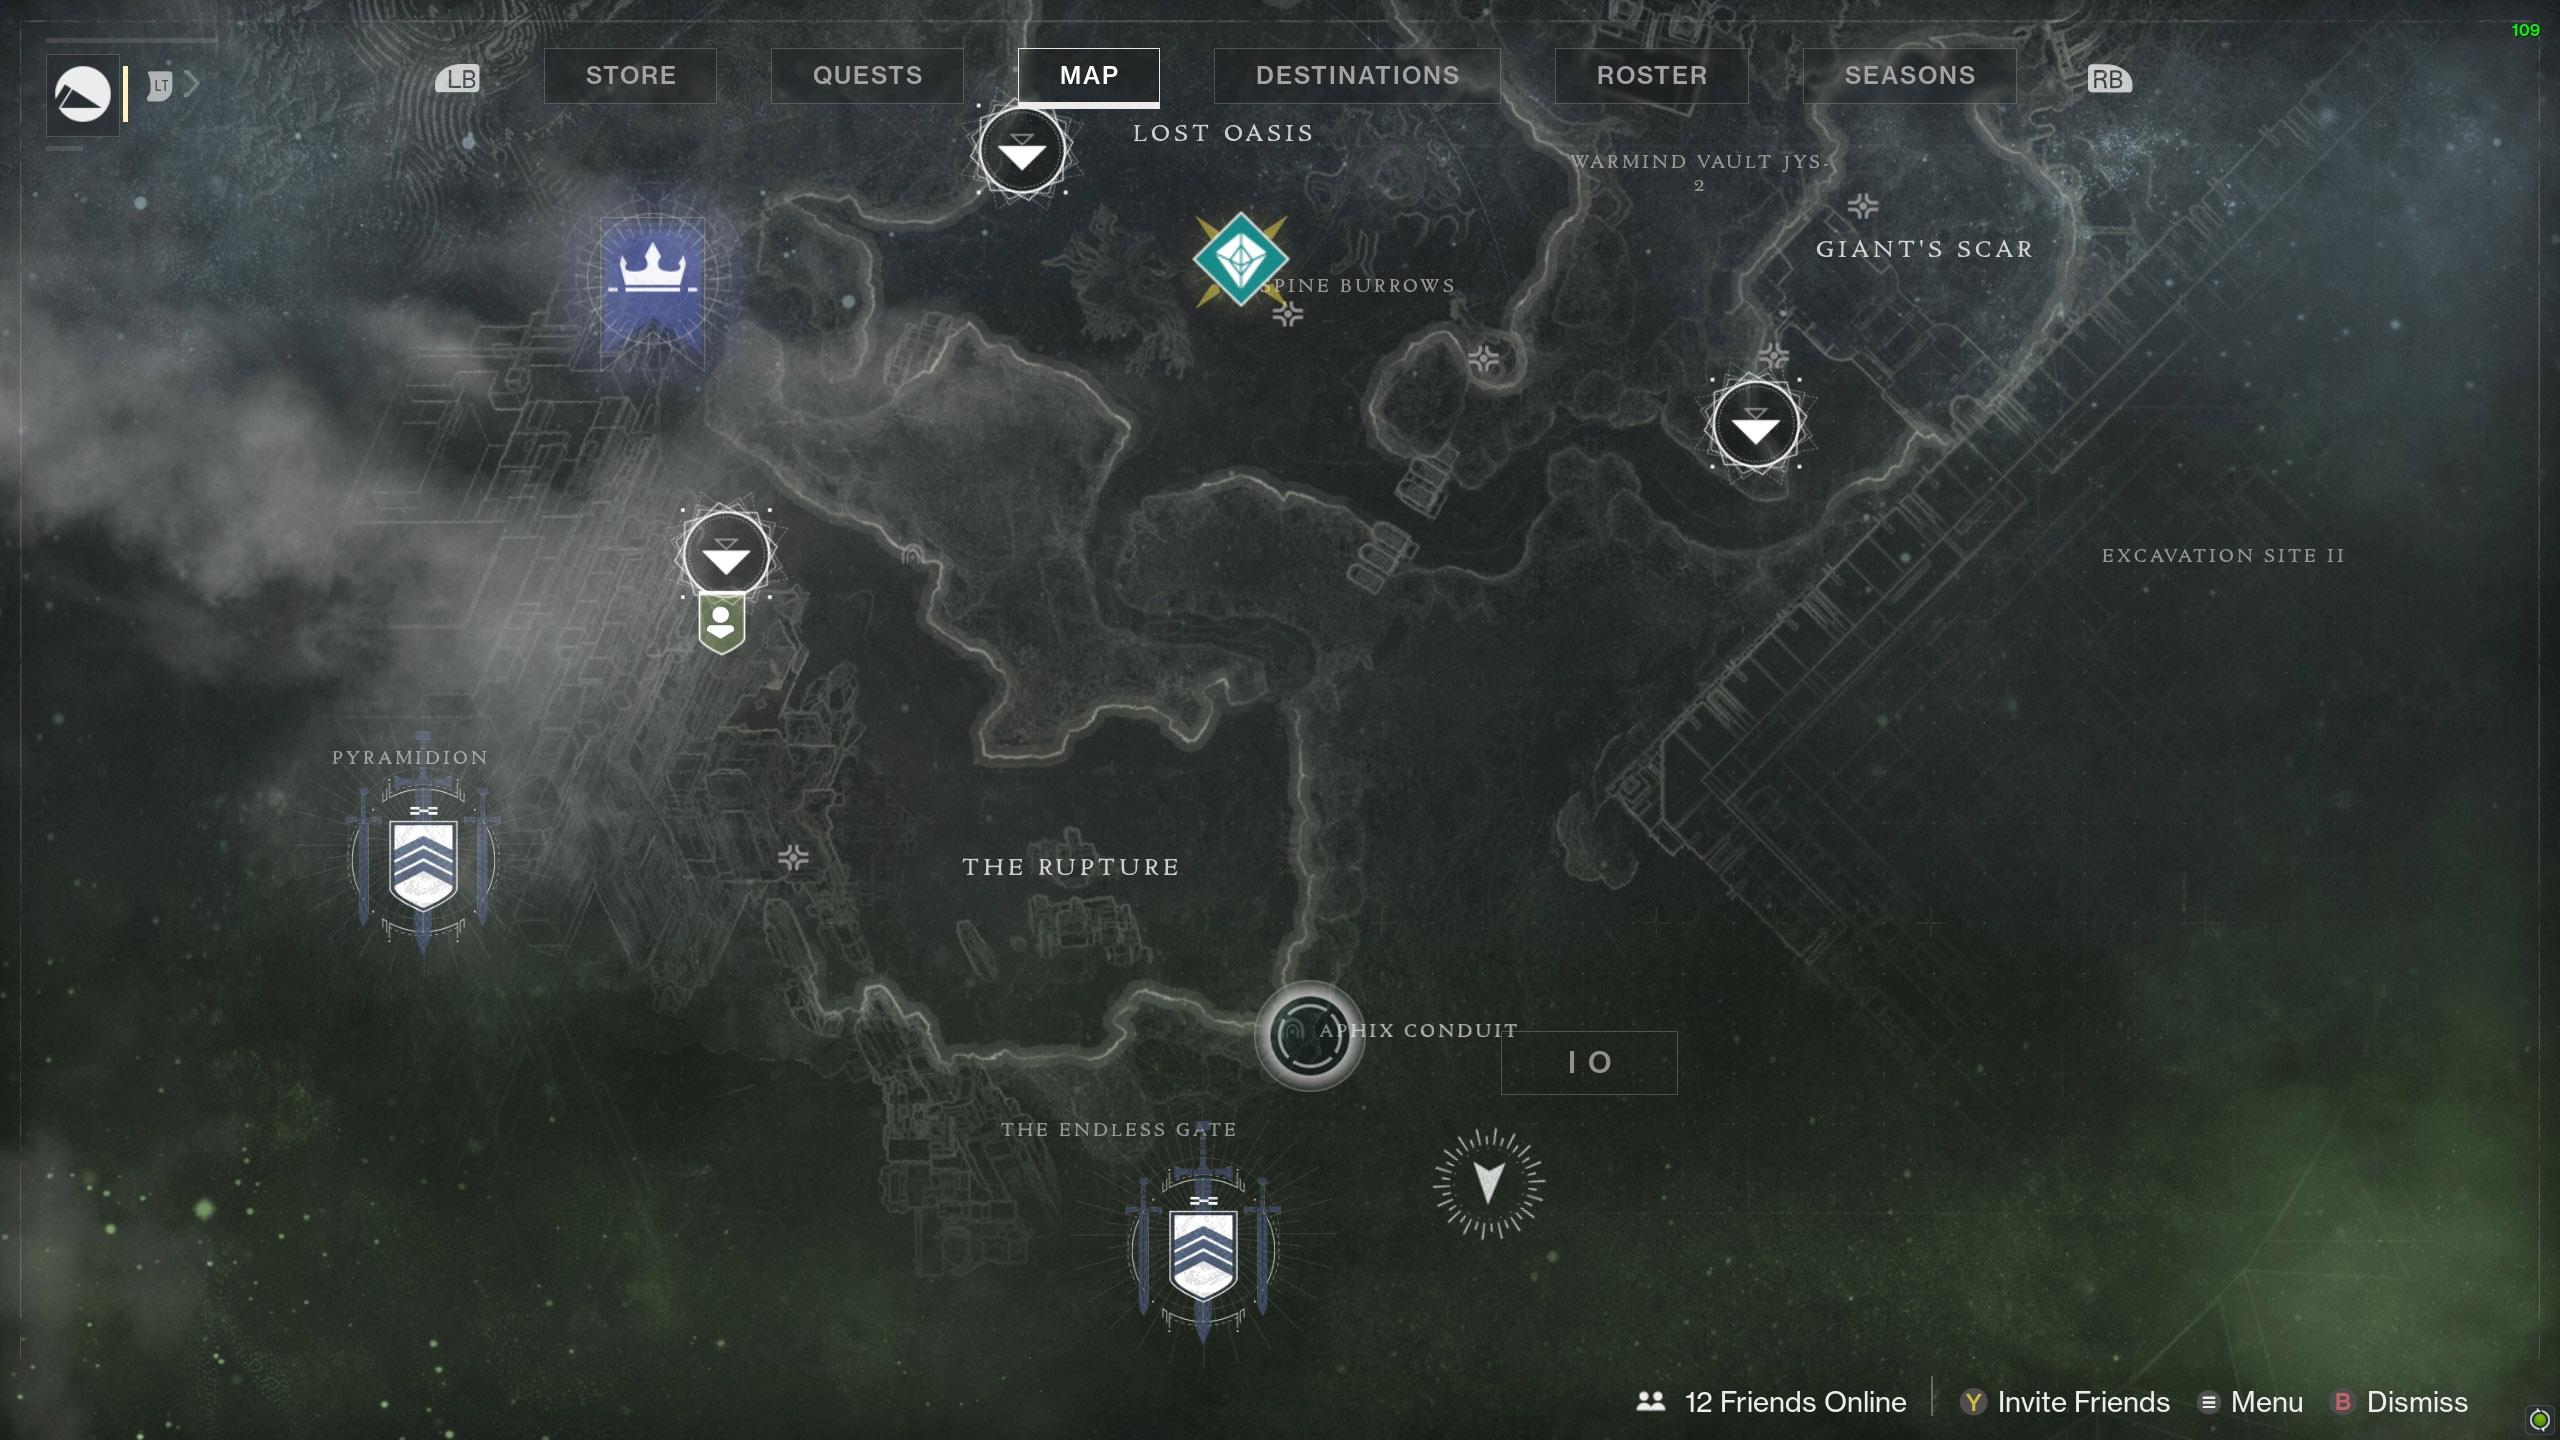 Destiny 2 Savanthuns Eyes Io Aphix Conduit map